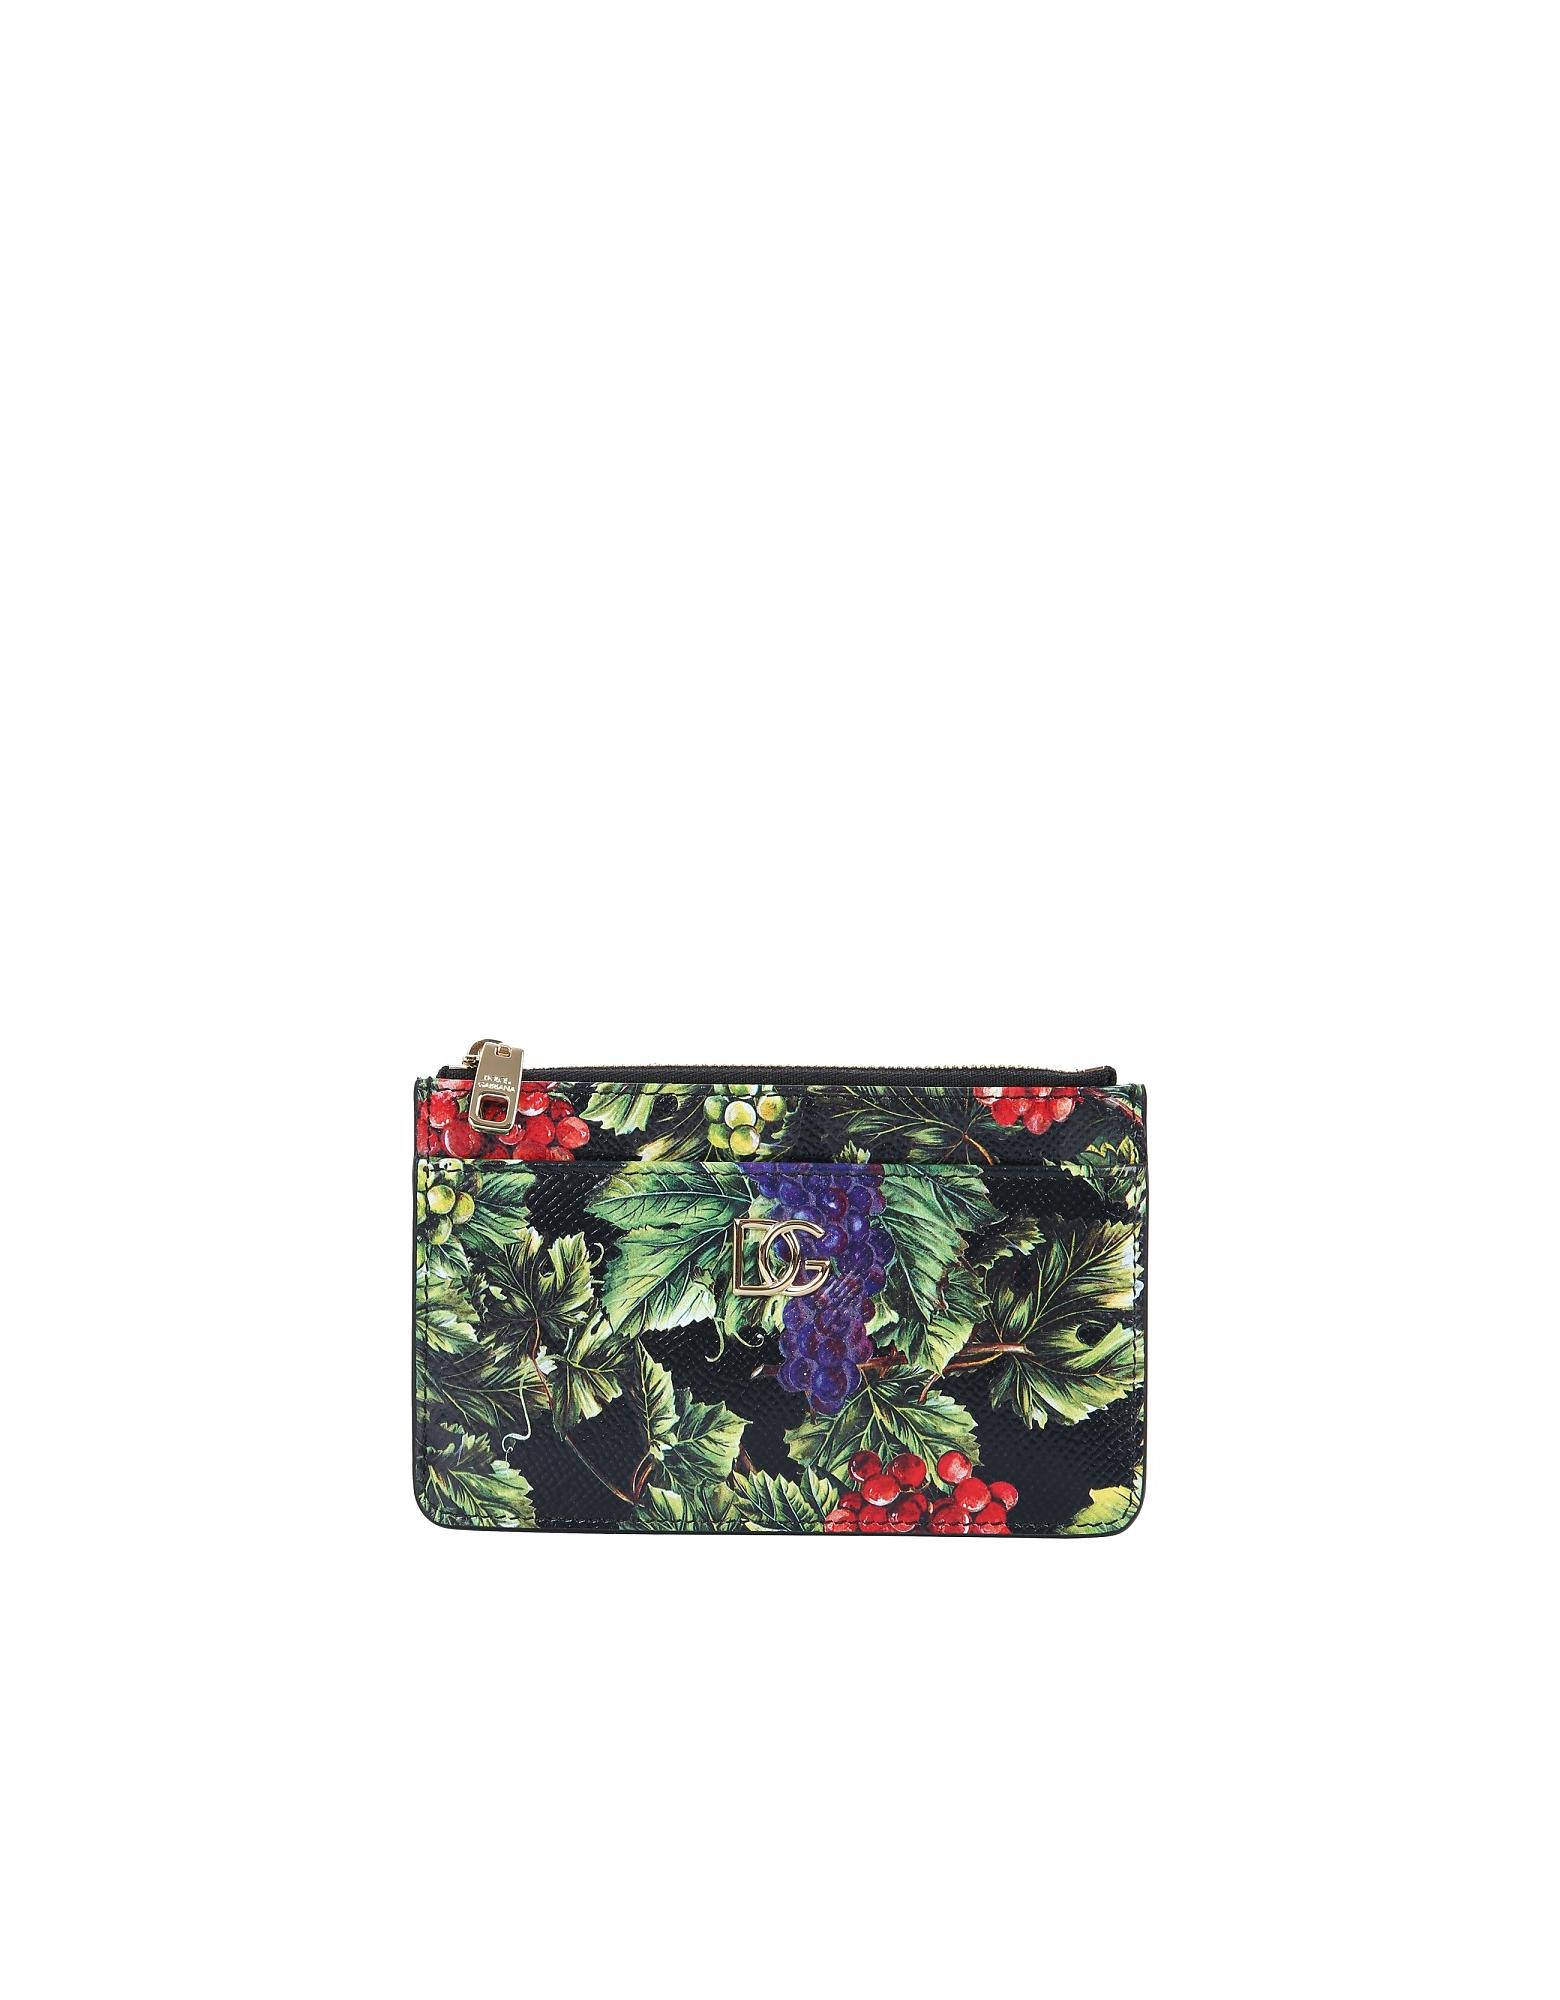 Dolce & Gabbana Cardholders CARD HOLDER WITH LOGO